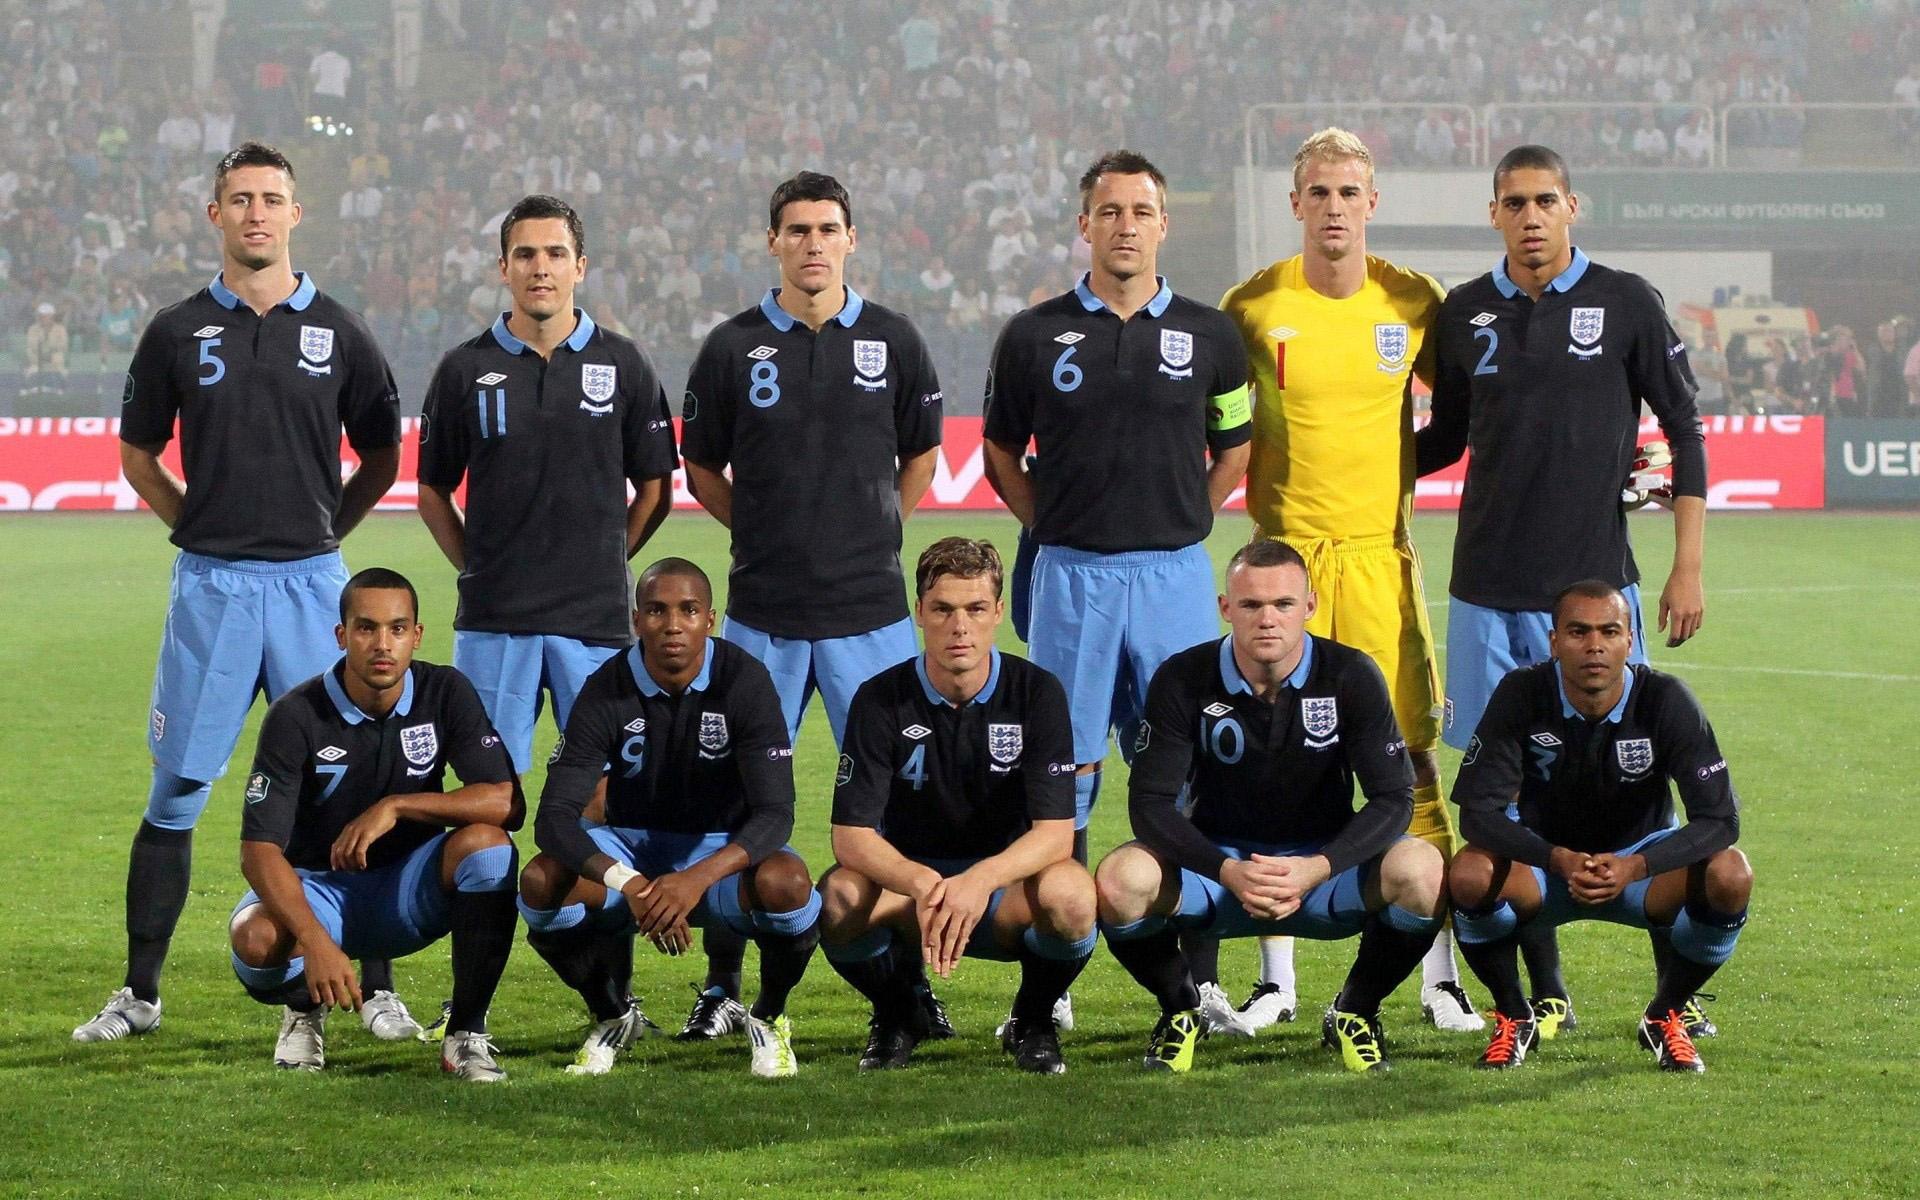 England Football Team Wallpapers